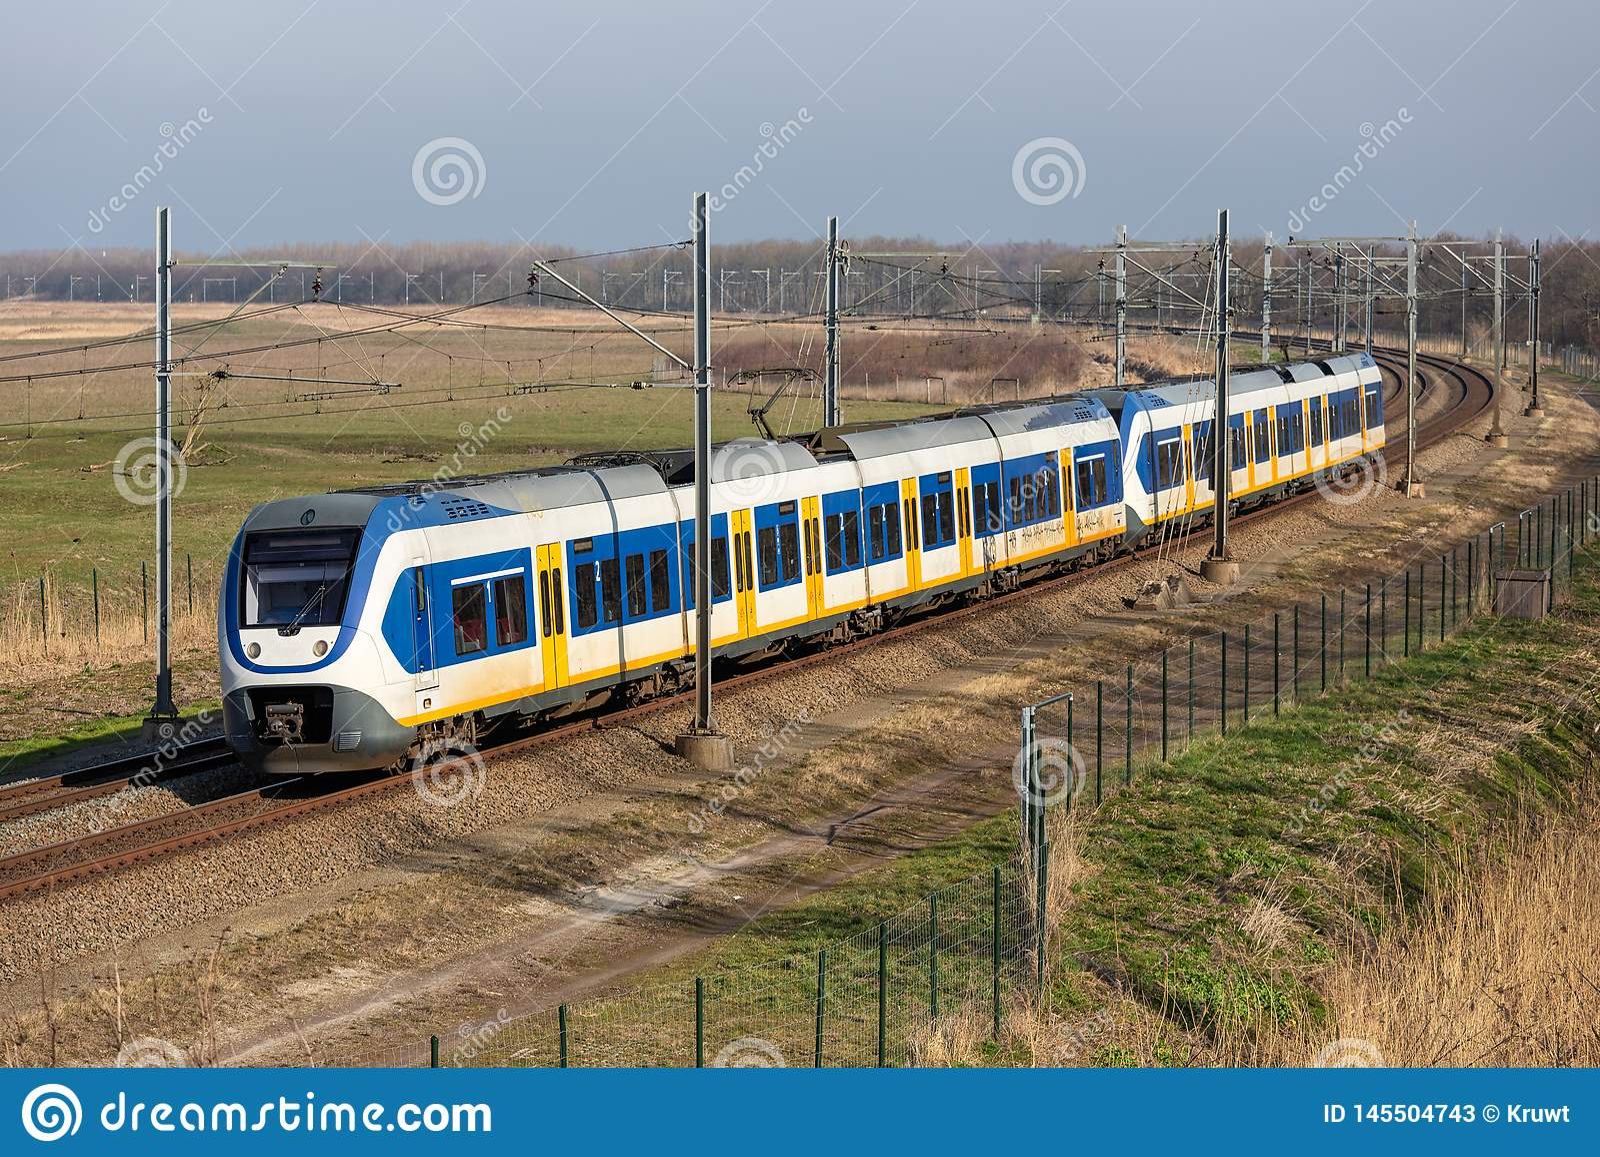 Dutch railway through National Park Oostvaardersplassen near Almere and Lelystad